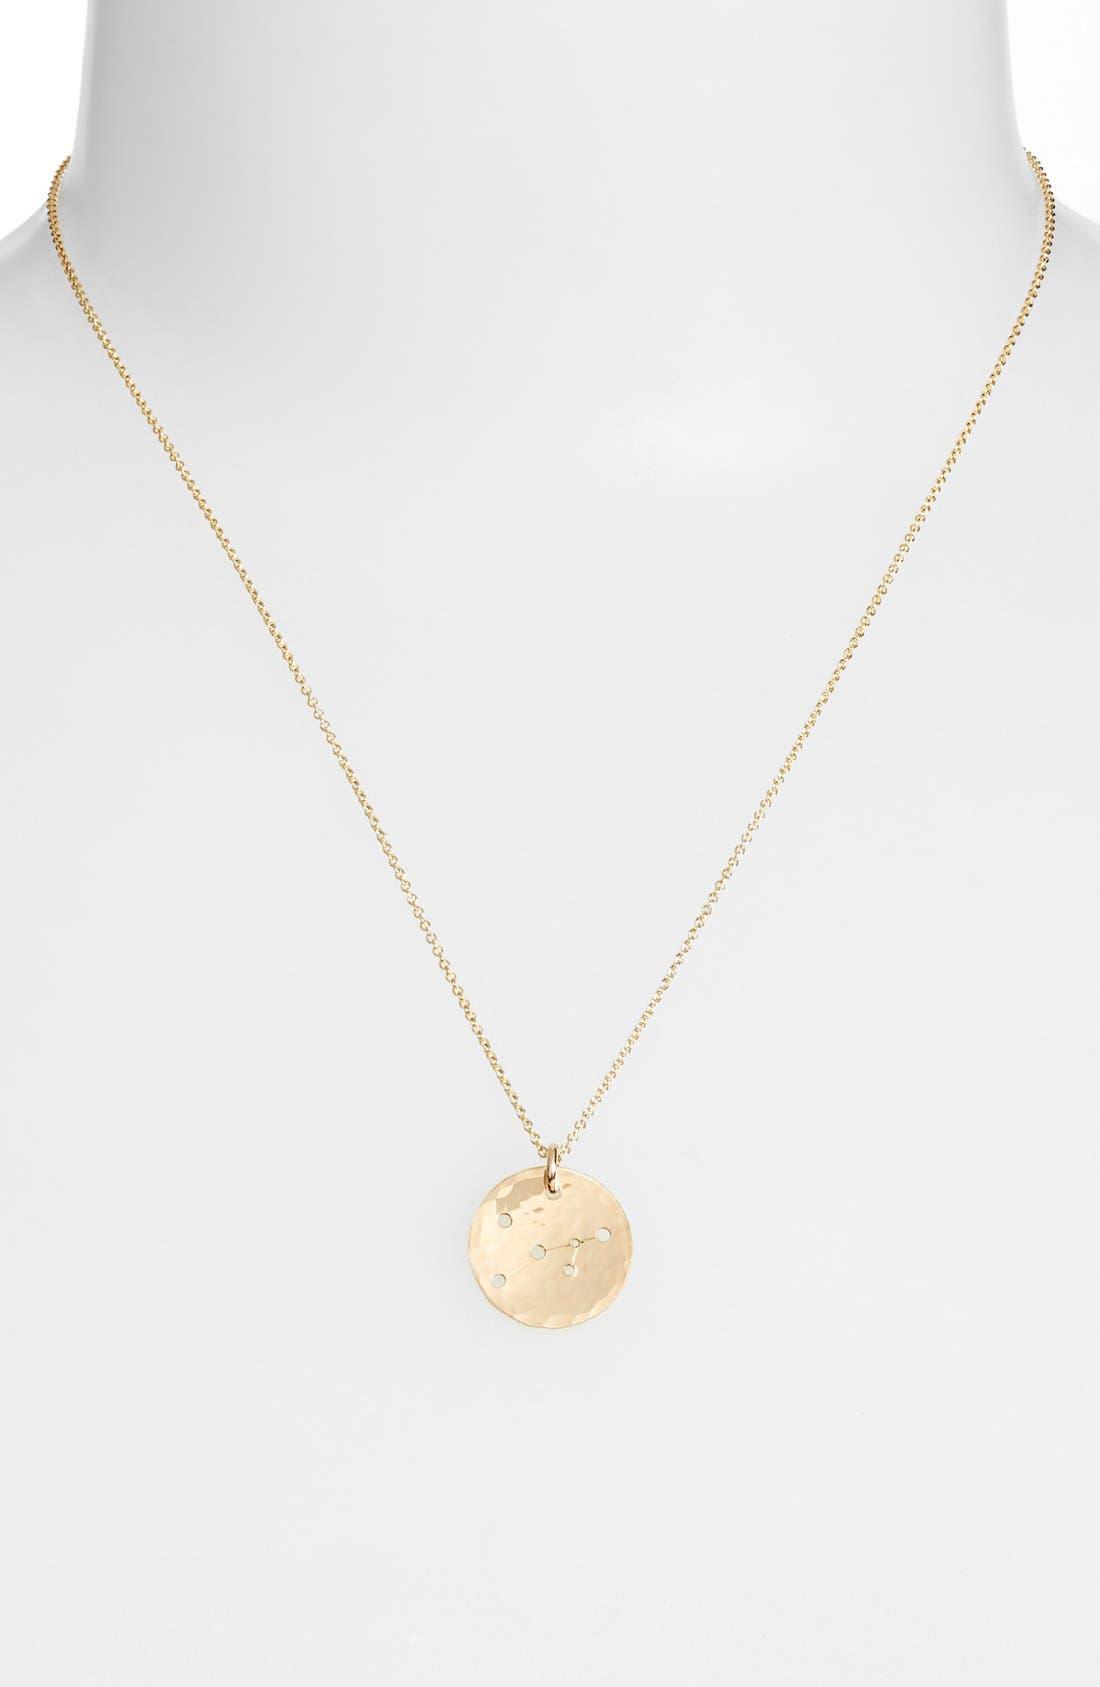 Ija 'Small Zodiac' 14k-Gold Fill Necklace,                             Alternate thumbnail 16, color,